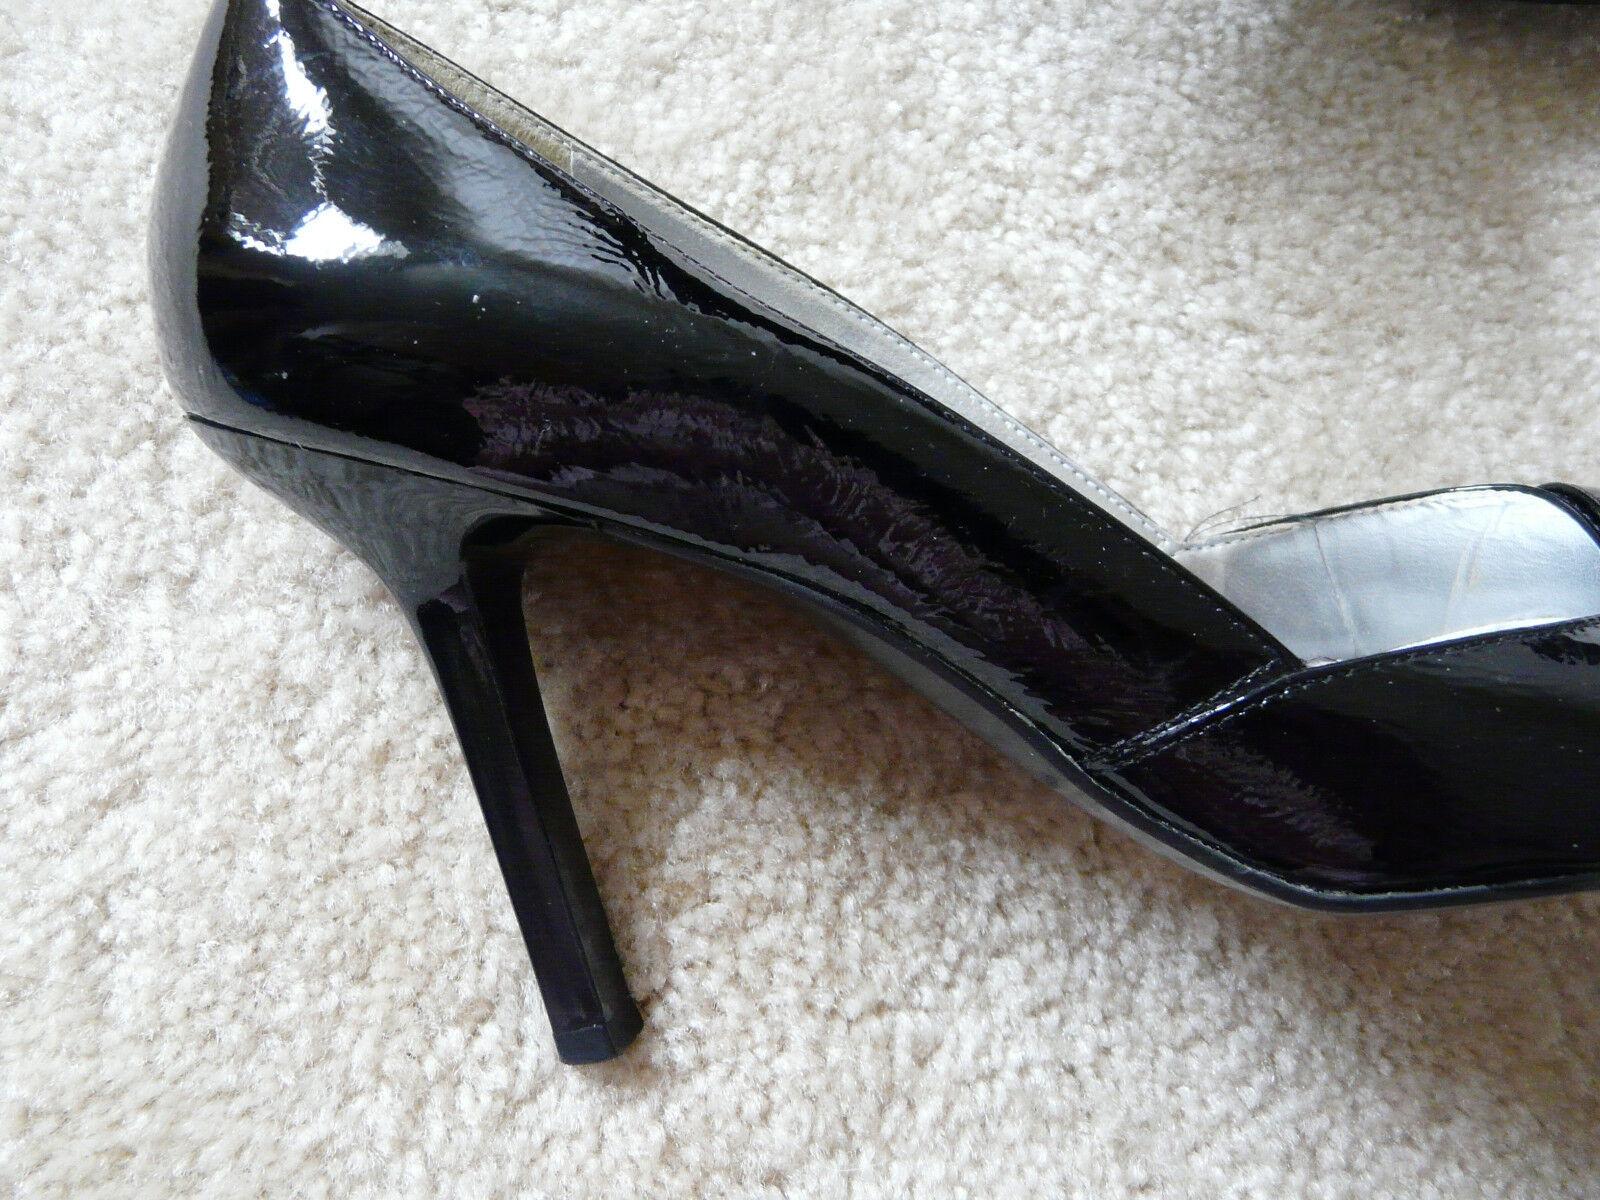 BCBGIRLS Schuhe SEXY STILETTOS BLACK PATENT LEATHER SIZE 9B WORN ONCE